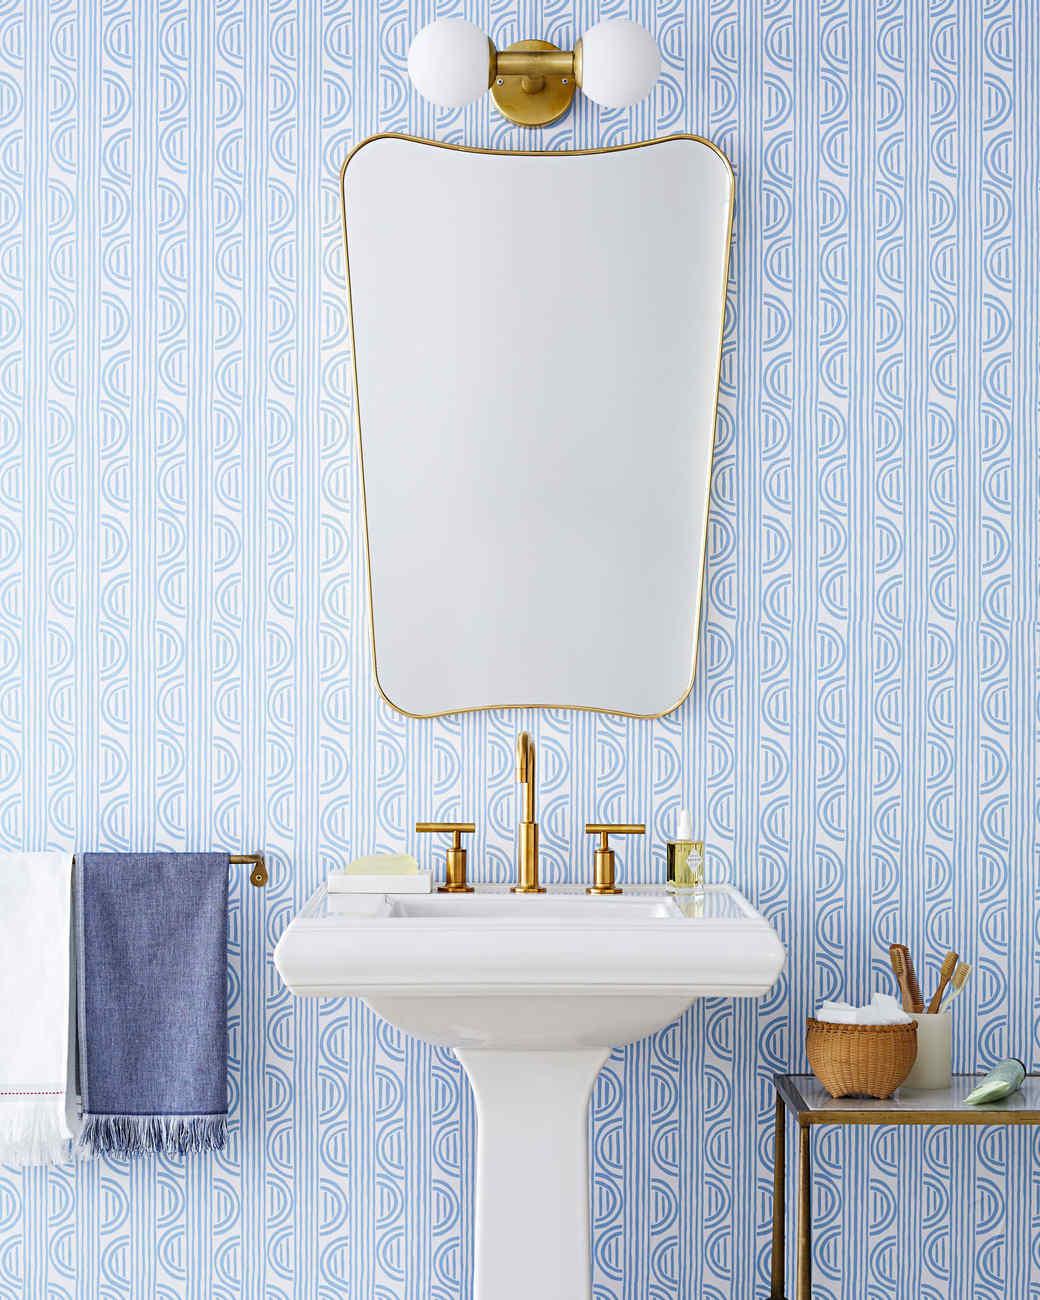 peel off wallpaper bathroom - How To Remove Wallpaper Easily